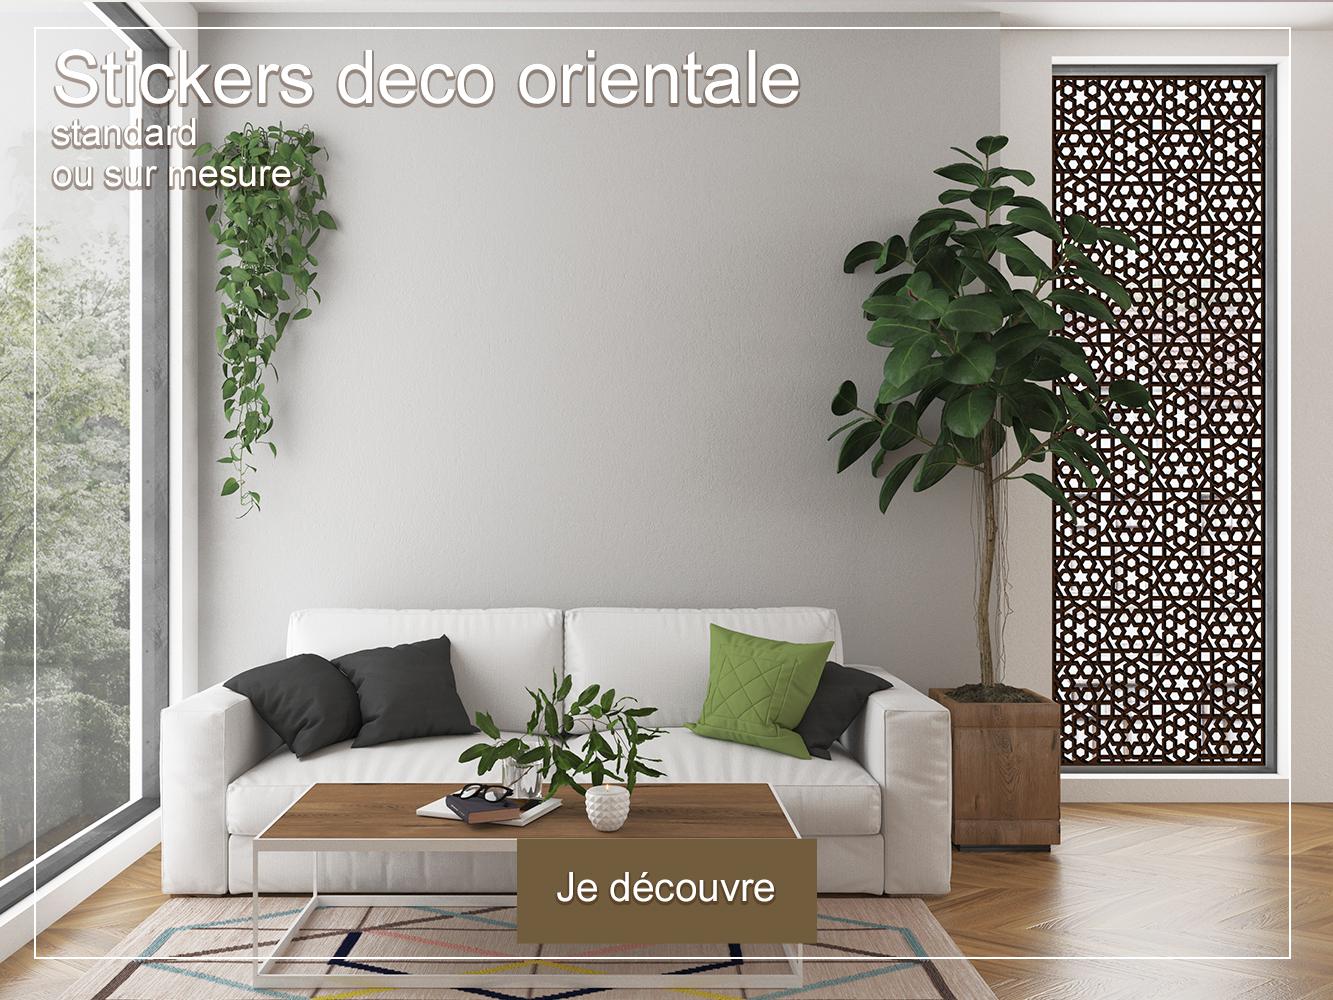 photo-stickers-deco-orientale-moucharabieh-sur-mesure-adhesif-murs-vitres-DECO-VITRES